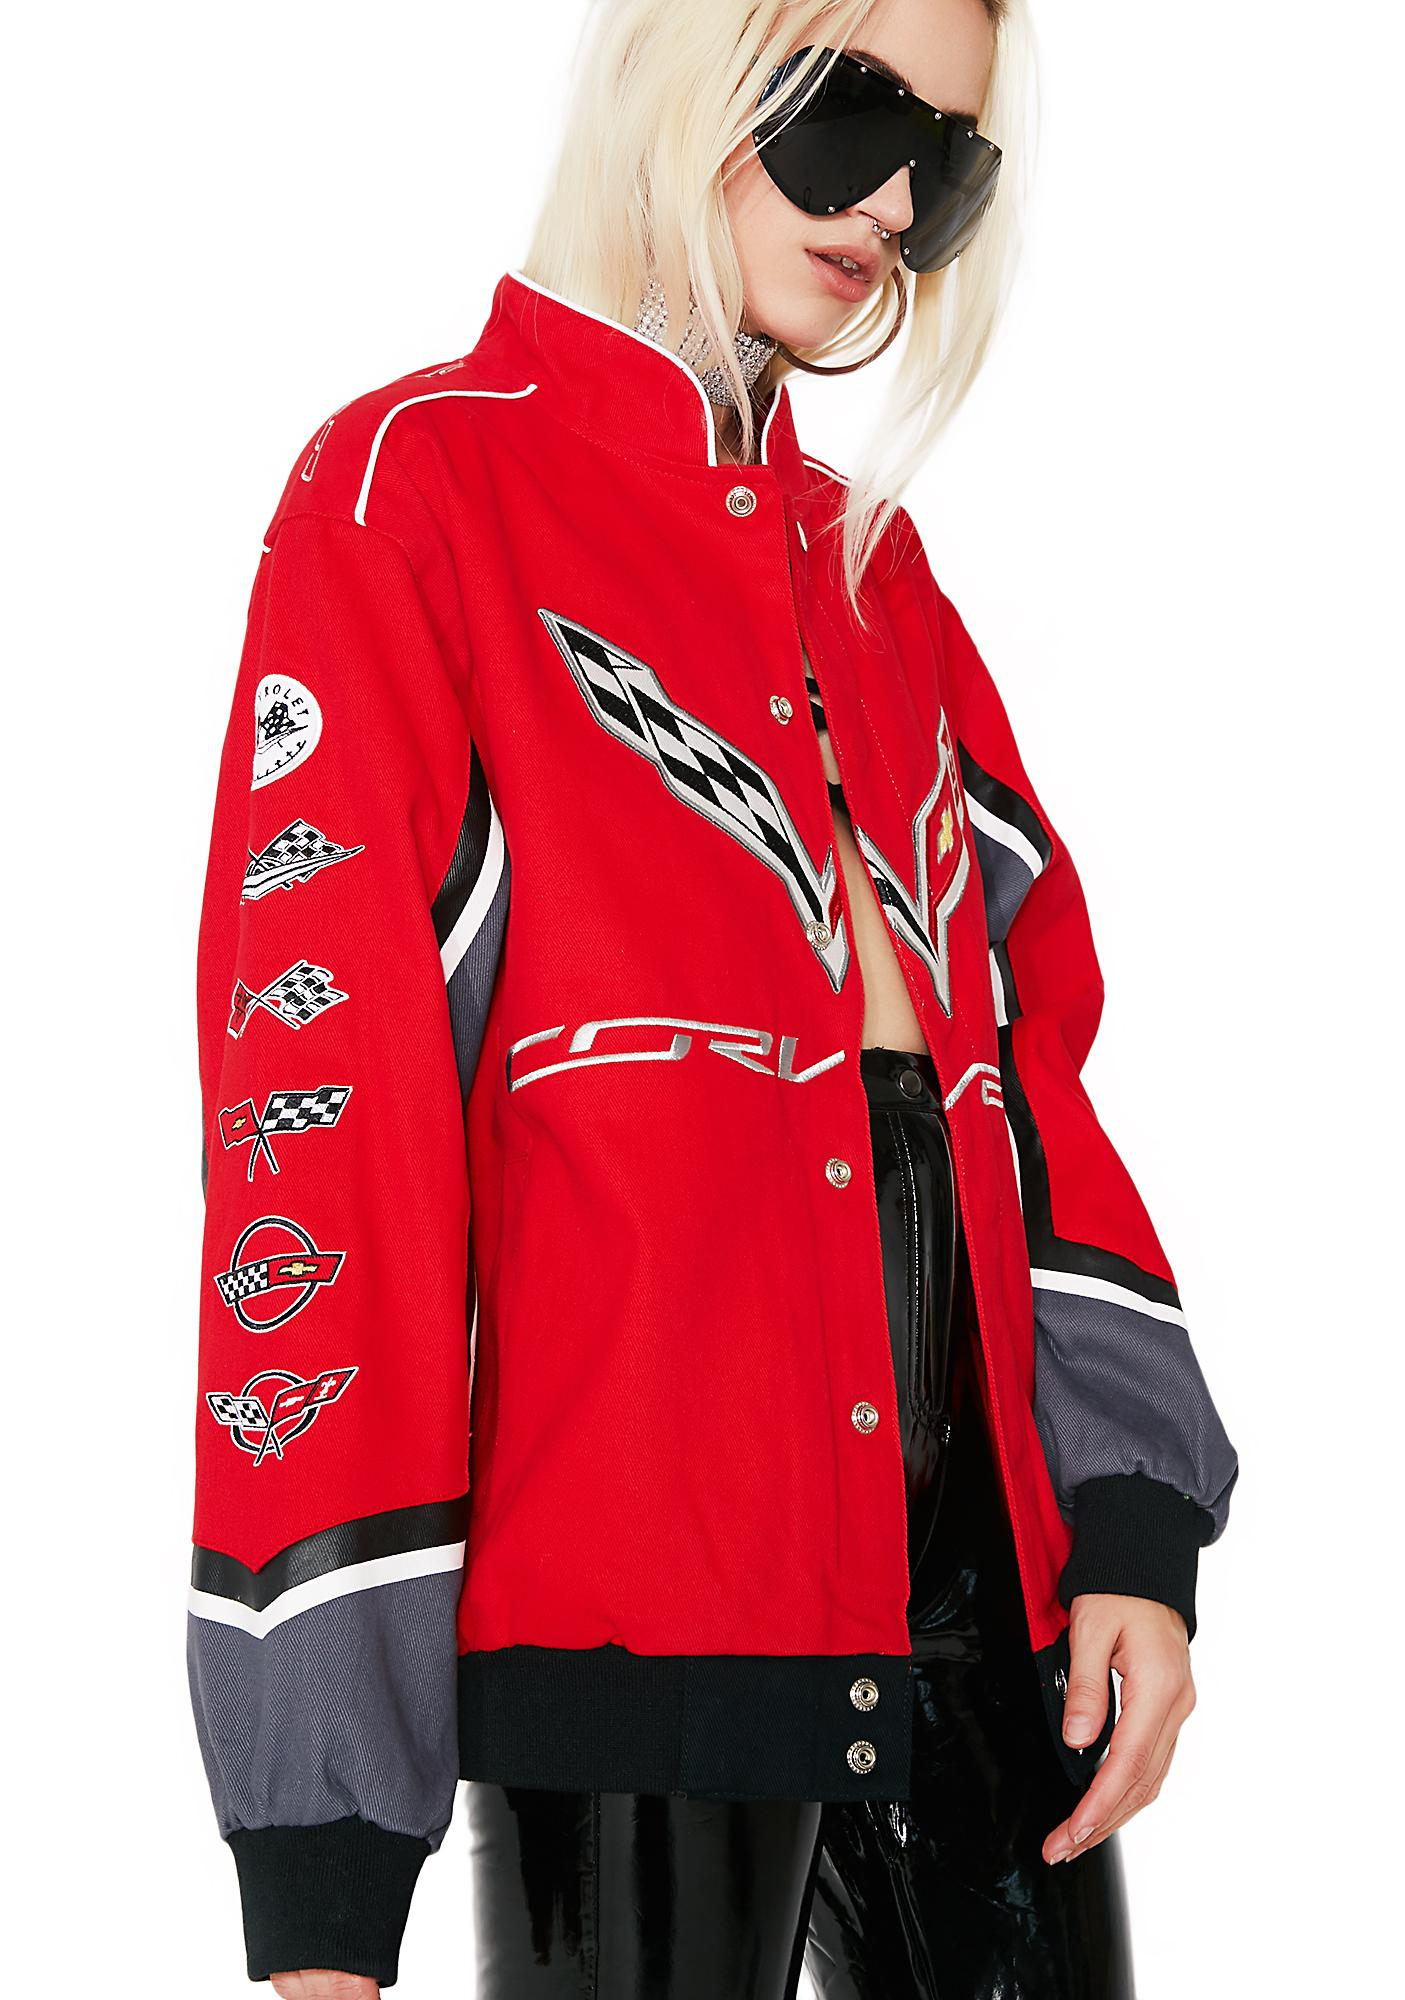 Maxi dress with denim jacket 2018 corvette